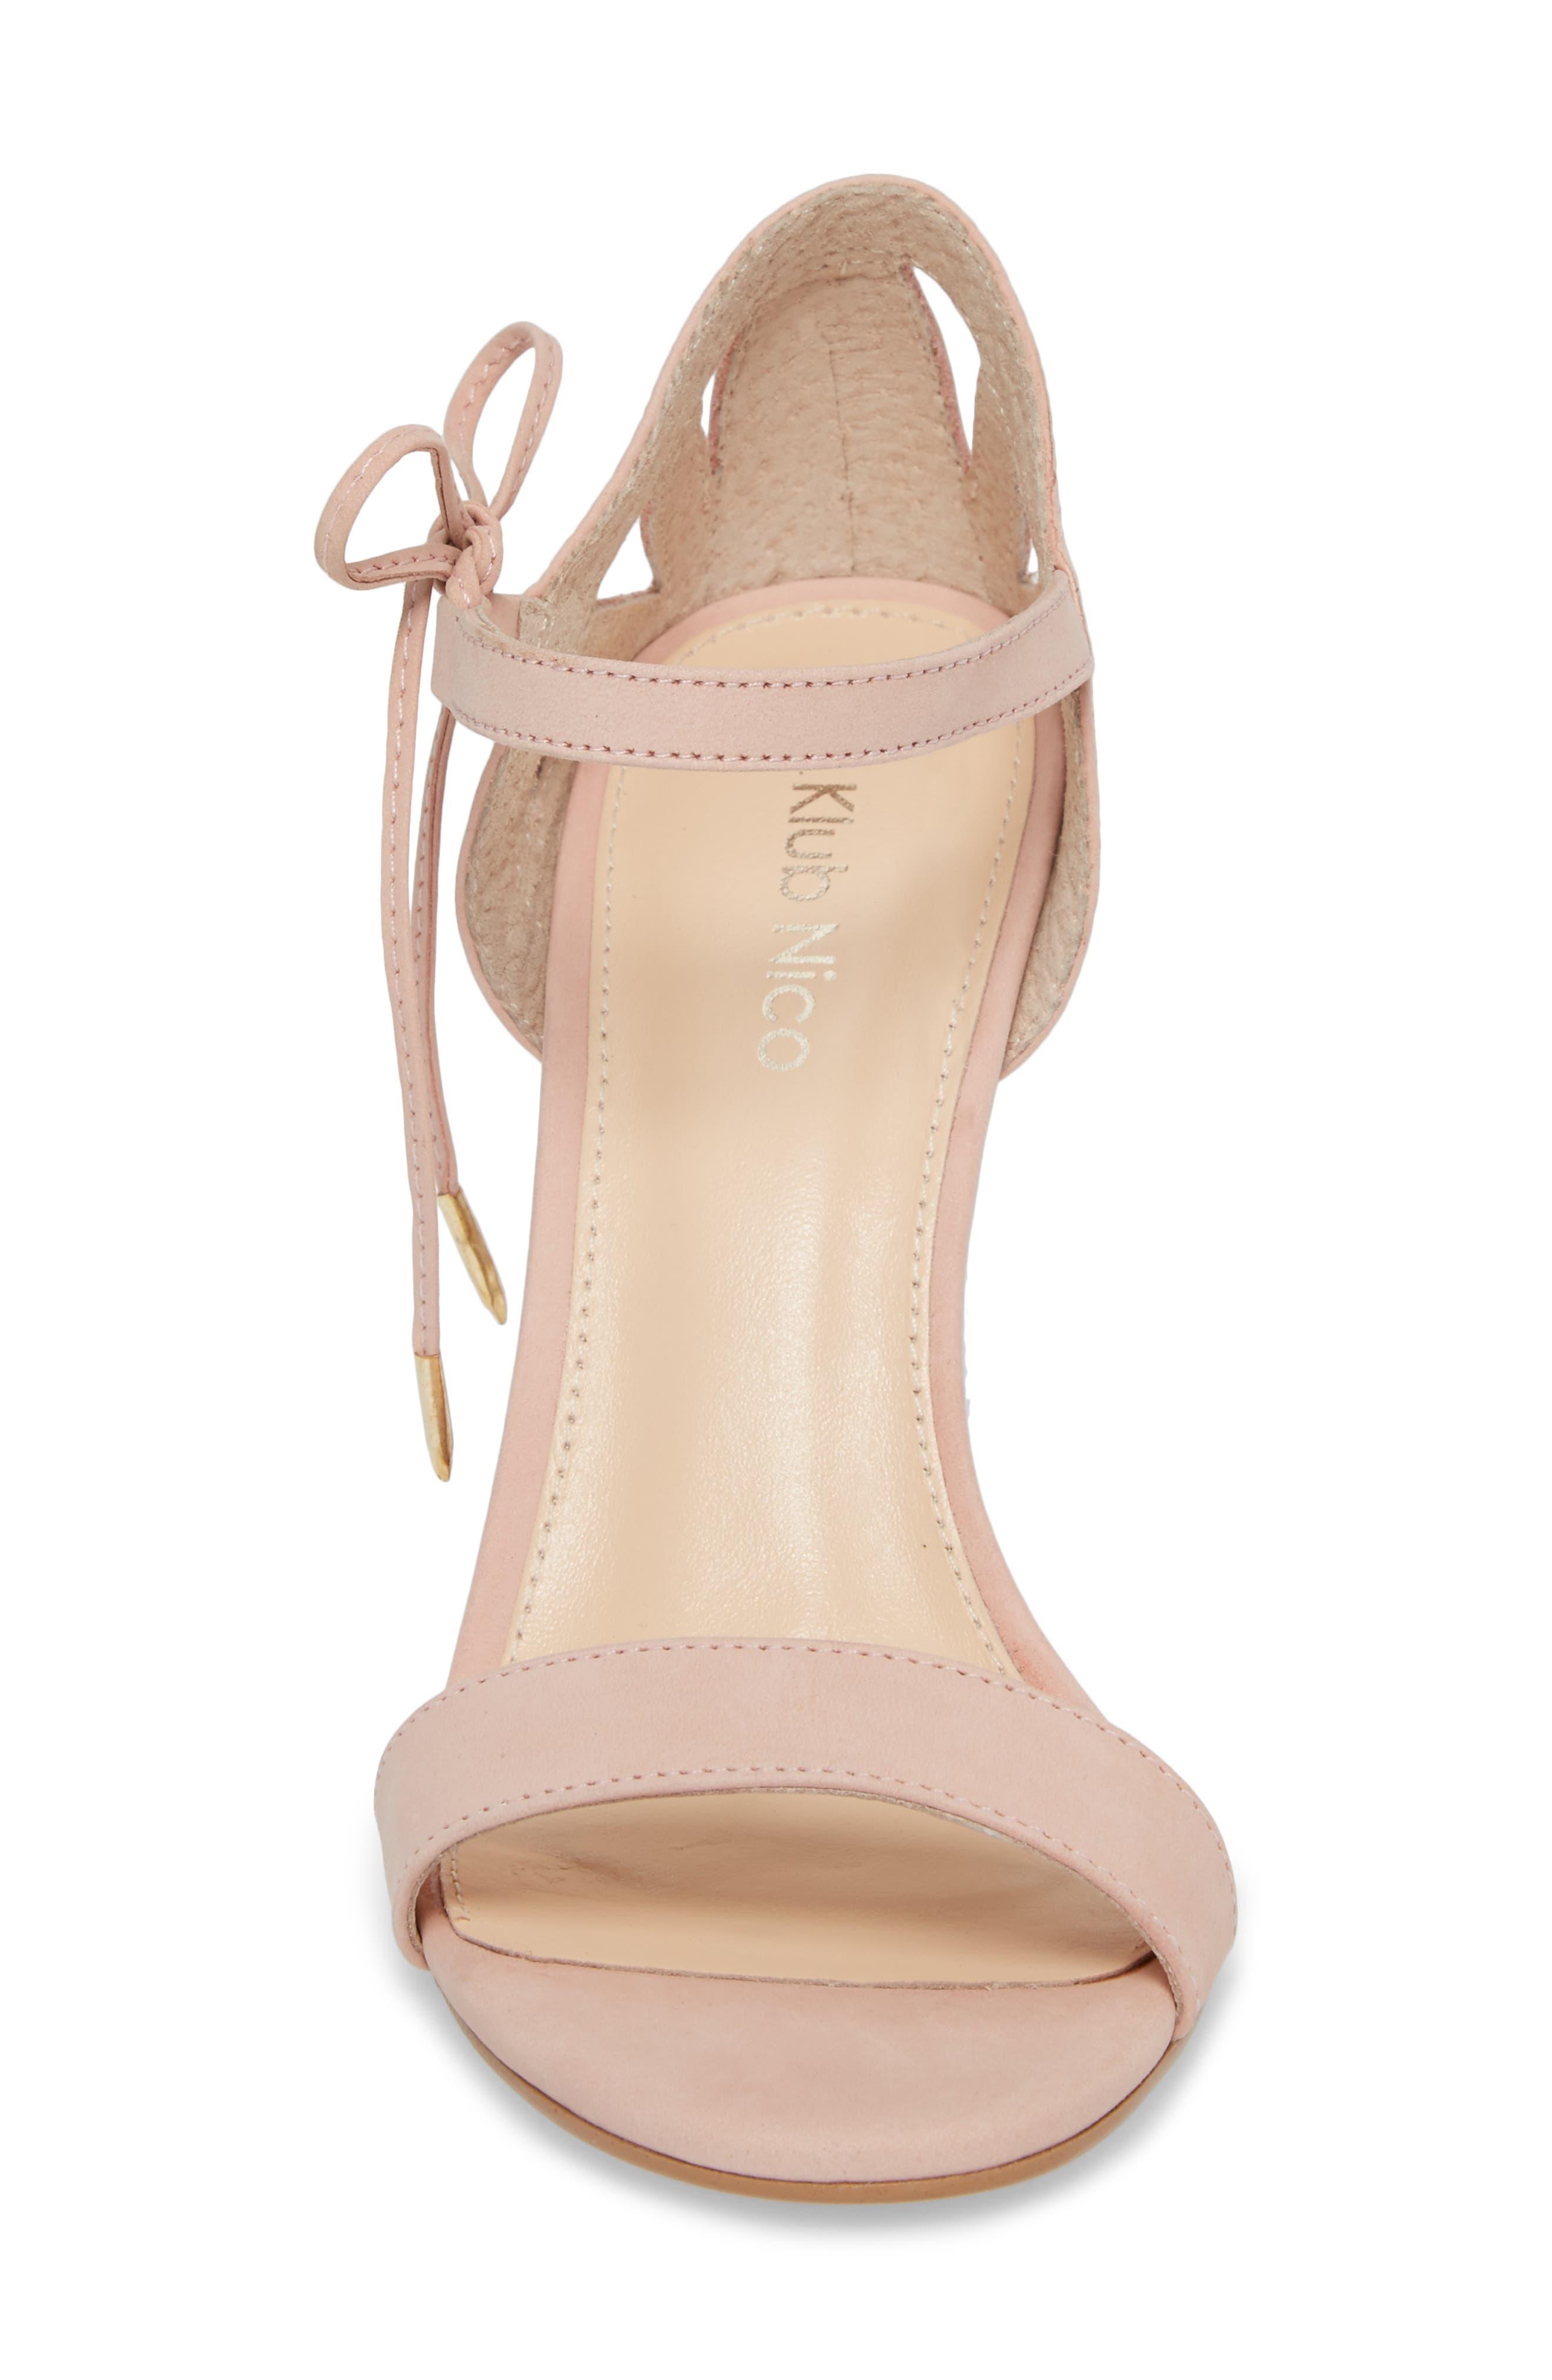 Adelyn Bow Tie Sandal,                             Alternate thumbnail 4, color,                             QUARTZ LEATHER